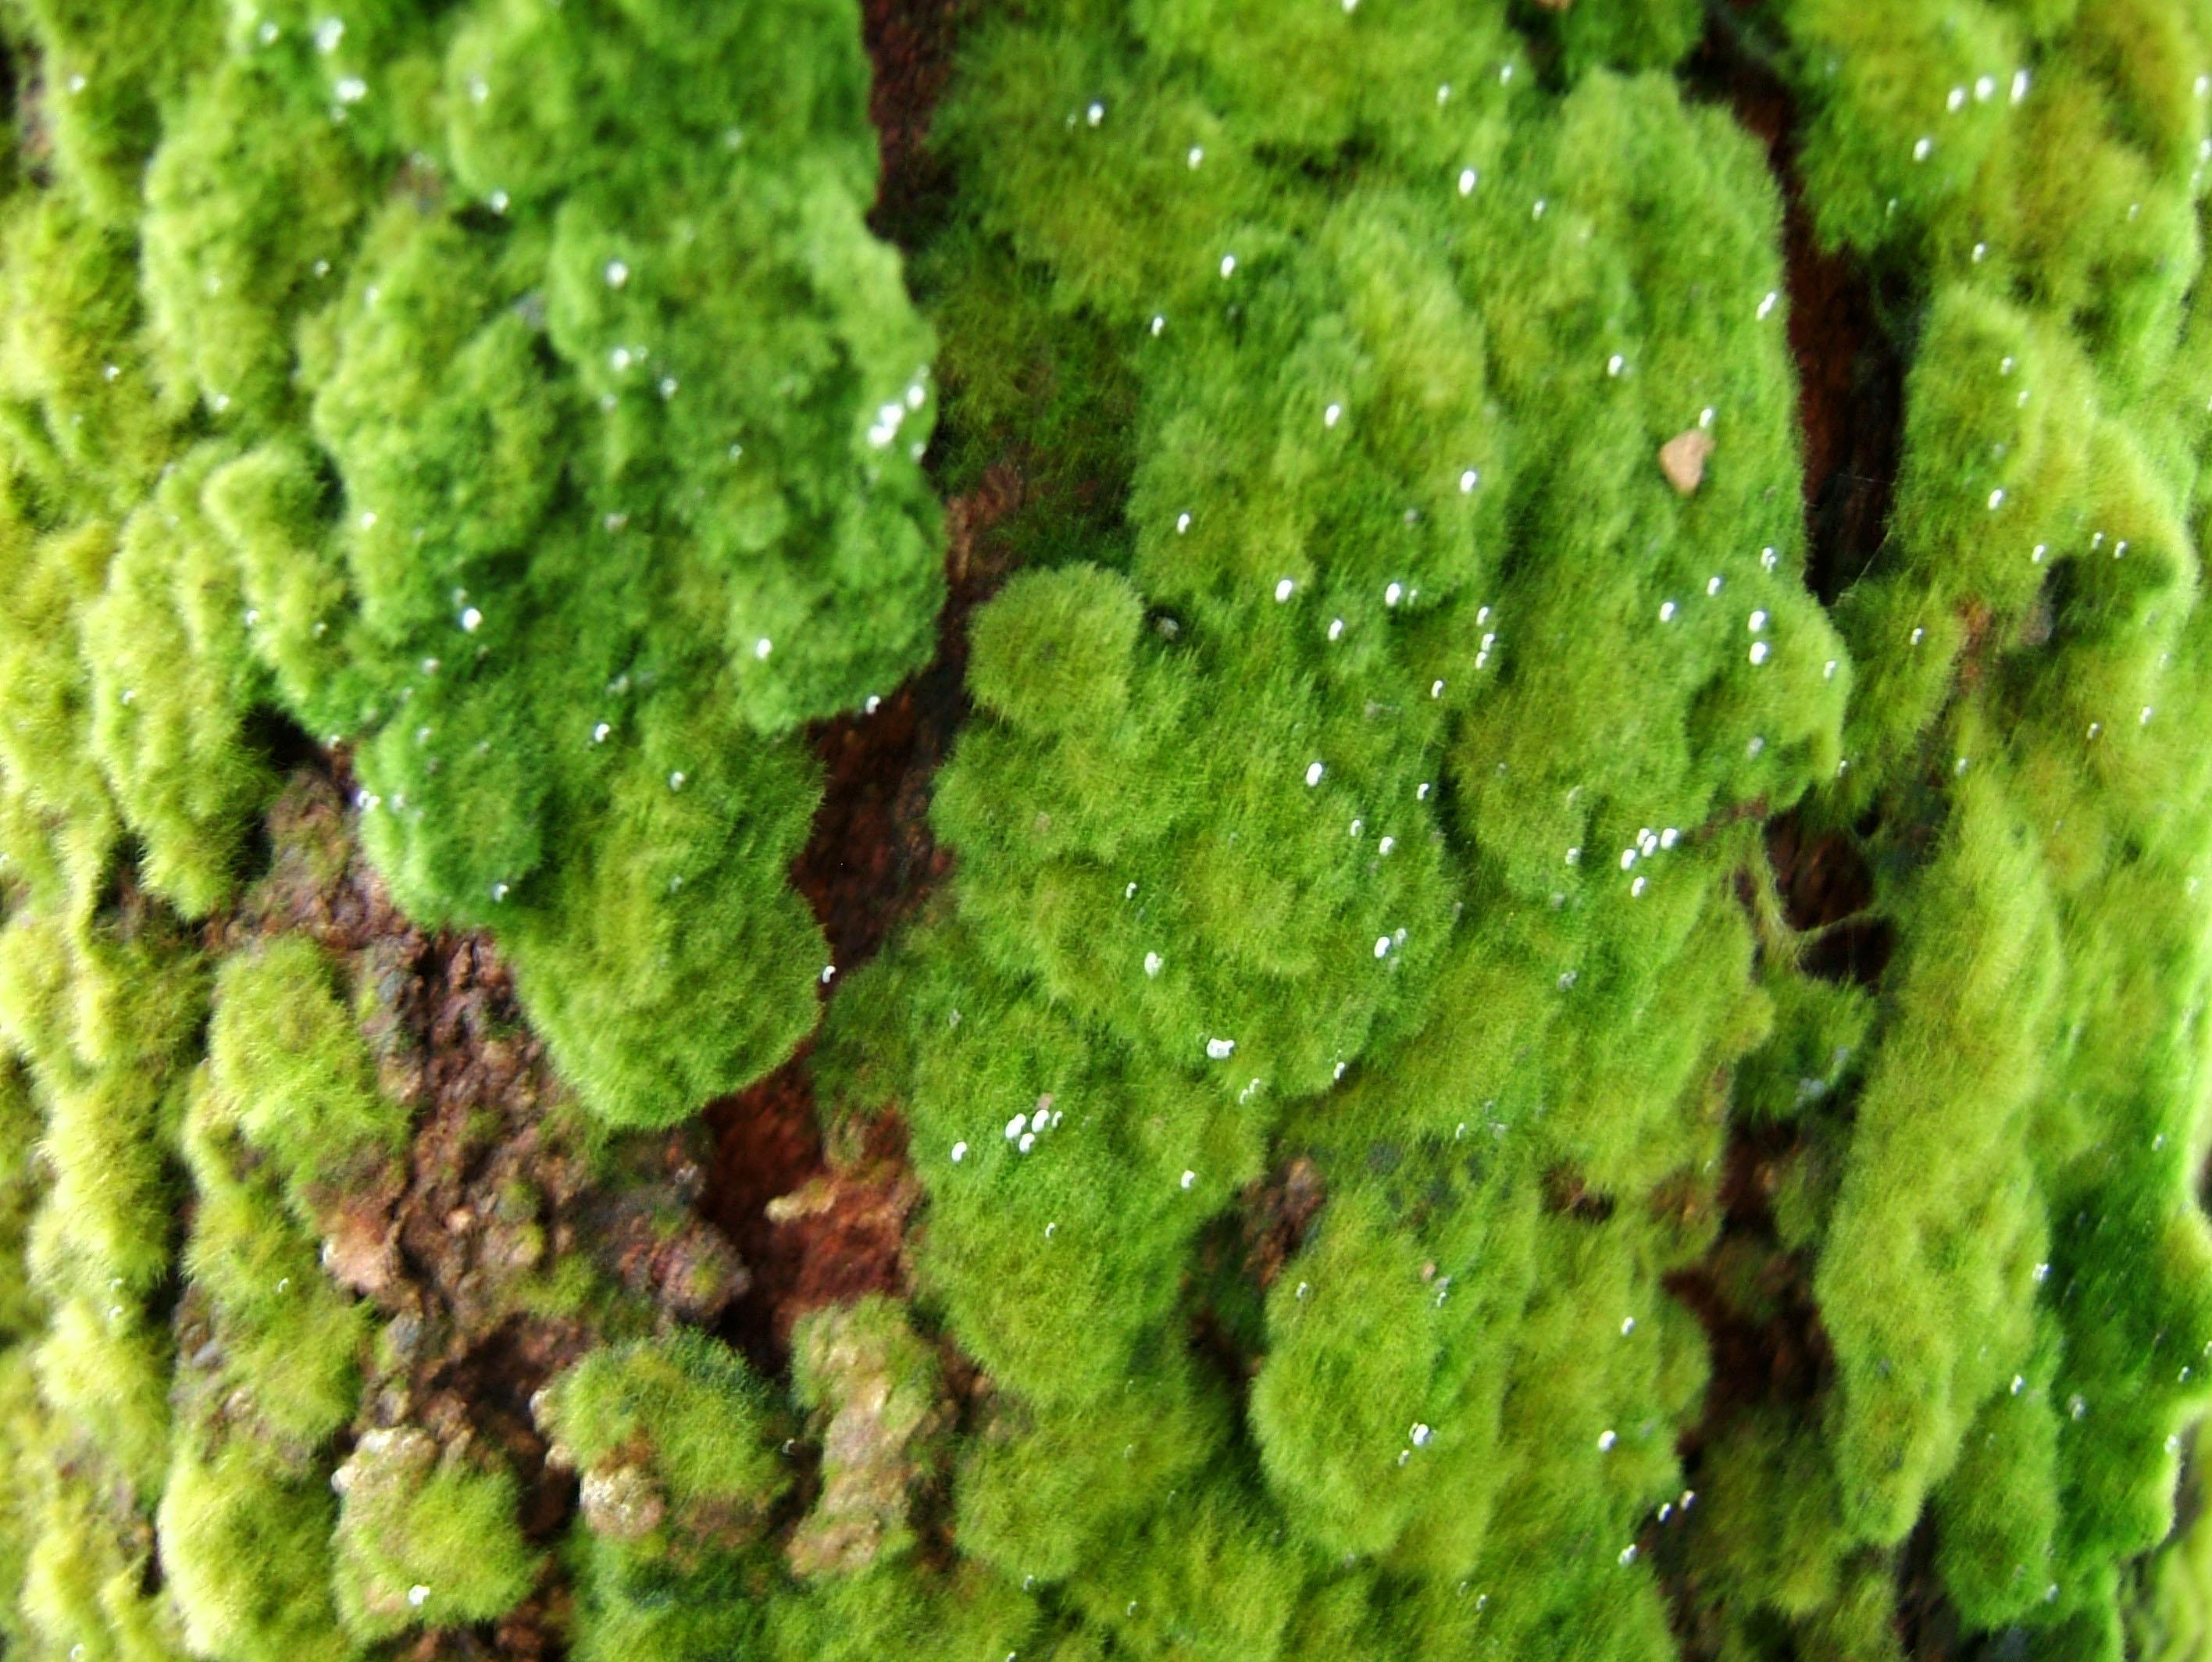 Textures Moss Singapore Botanical Gardens 02